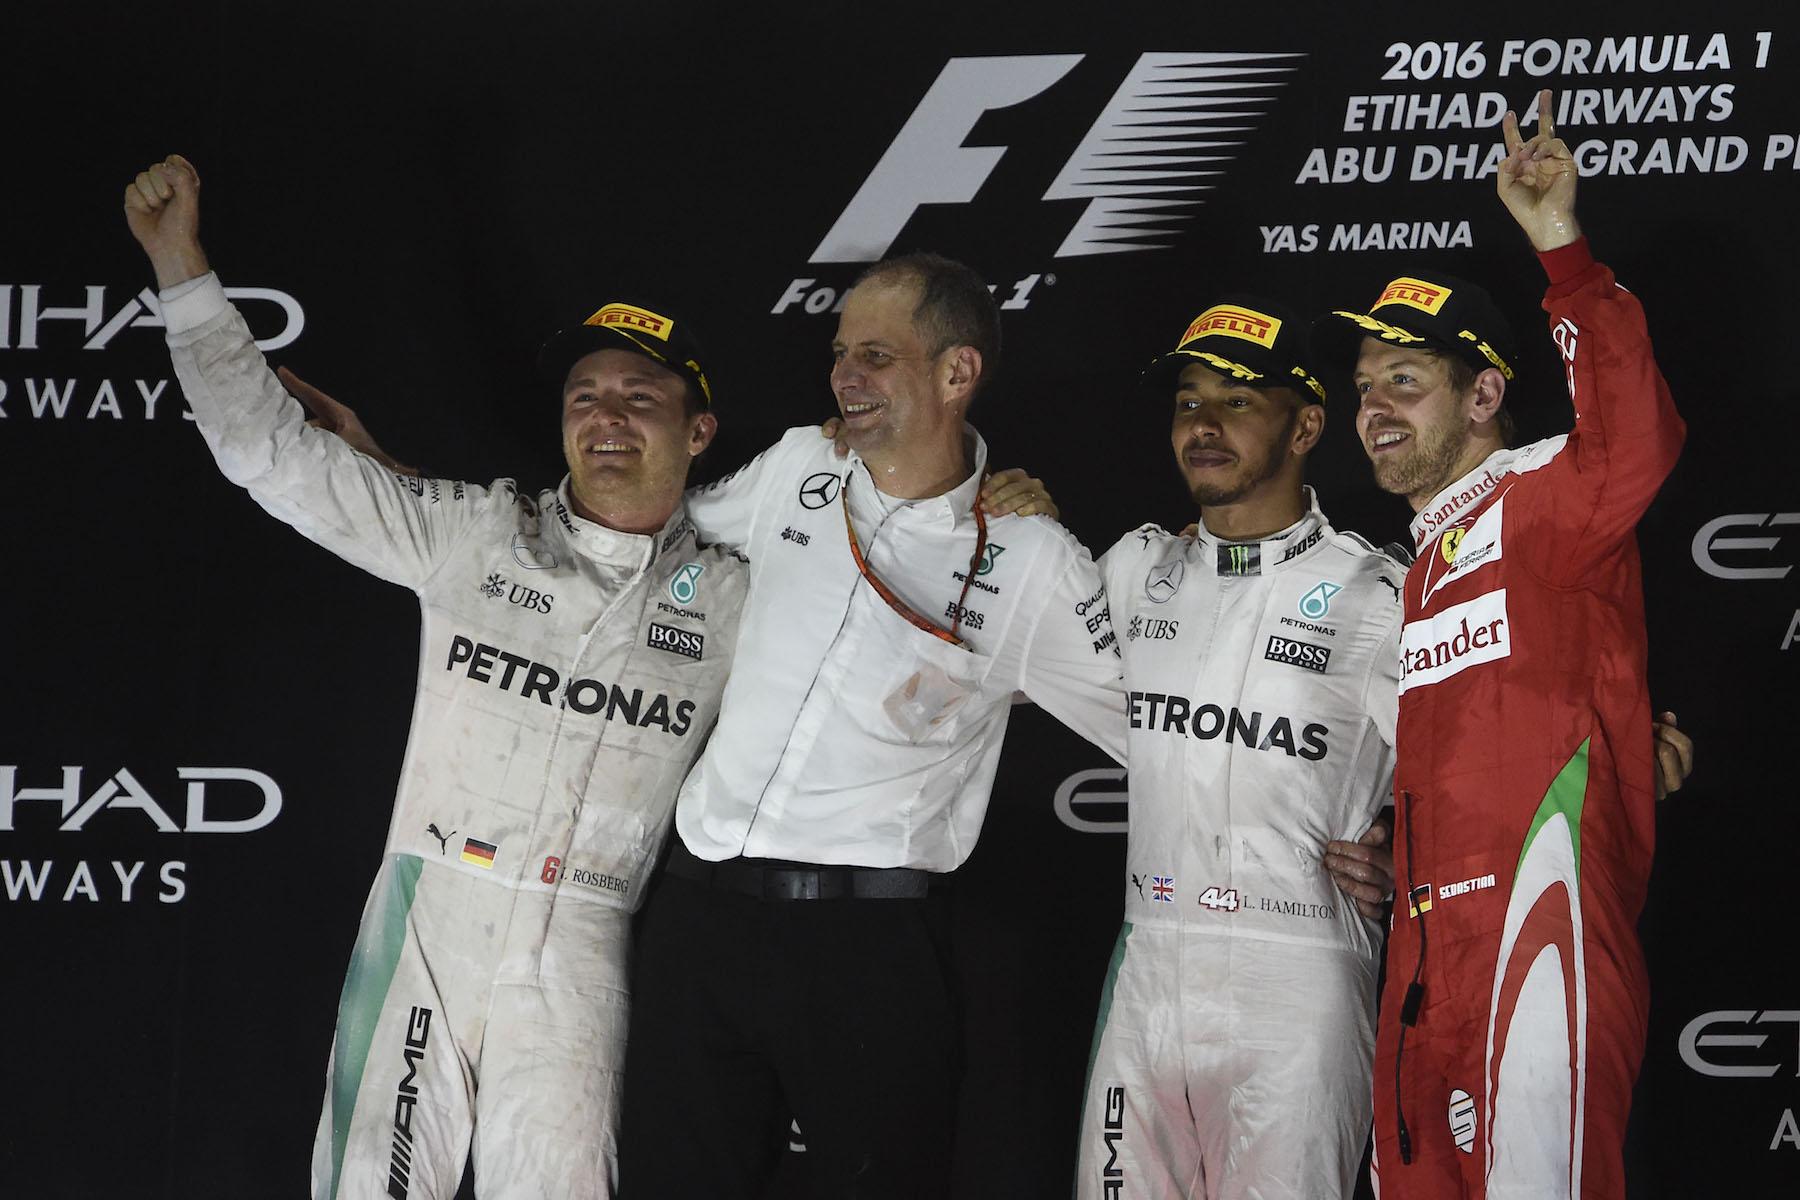 Salracing - The 2016 Abu Dhabi Grand Prix podium